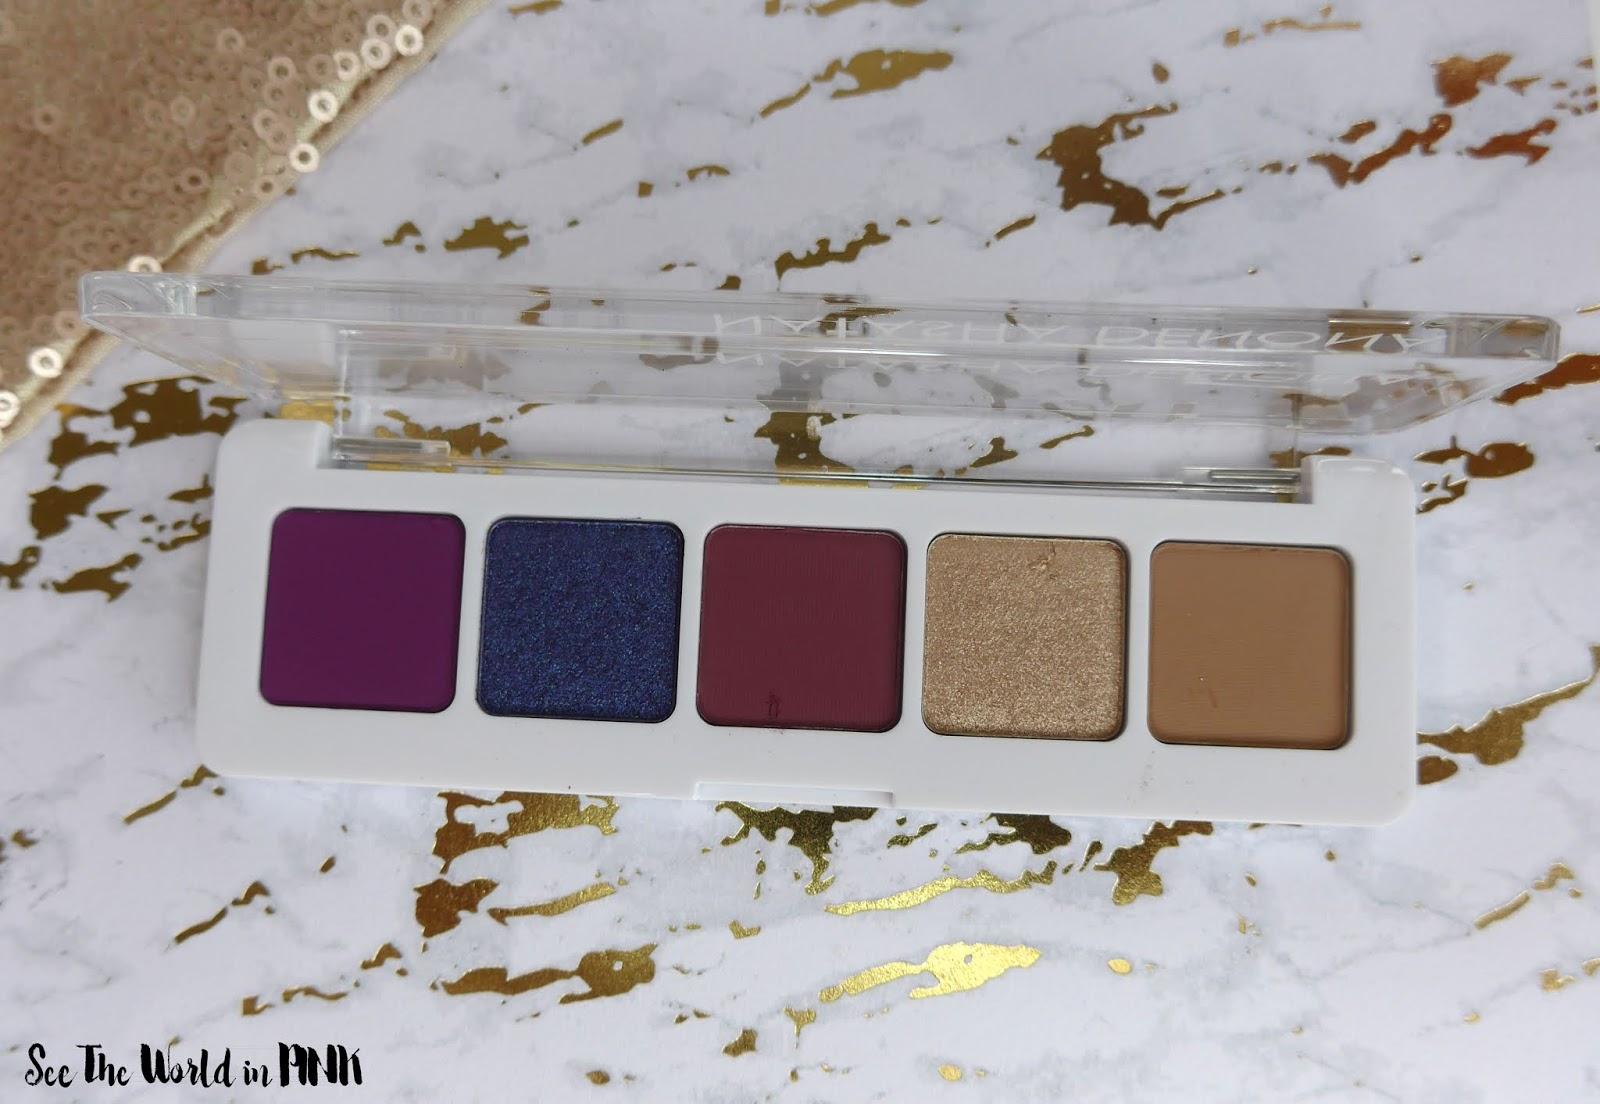 Biba All Neutral Eyeshadow Palette by Natasha Denona #22